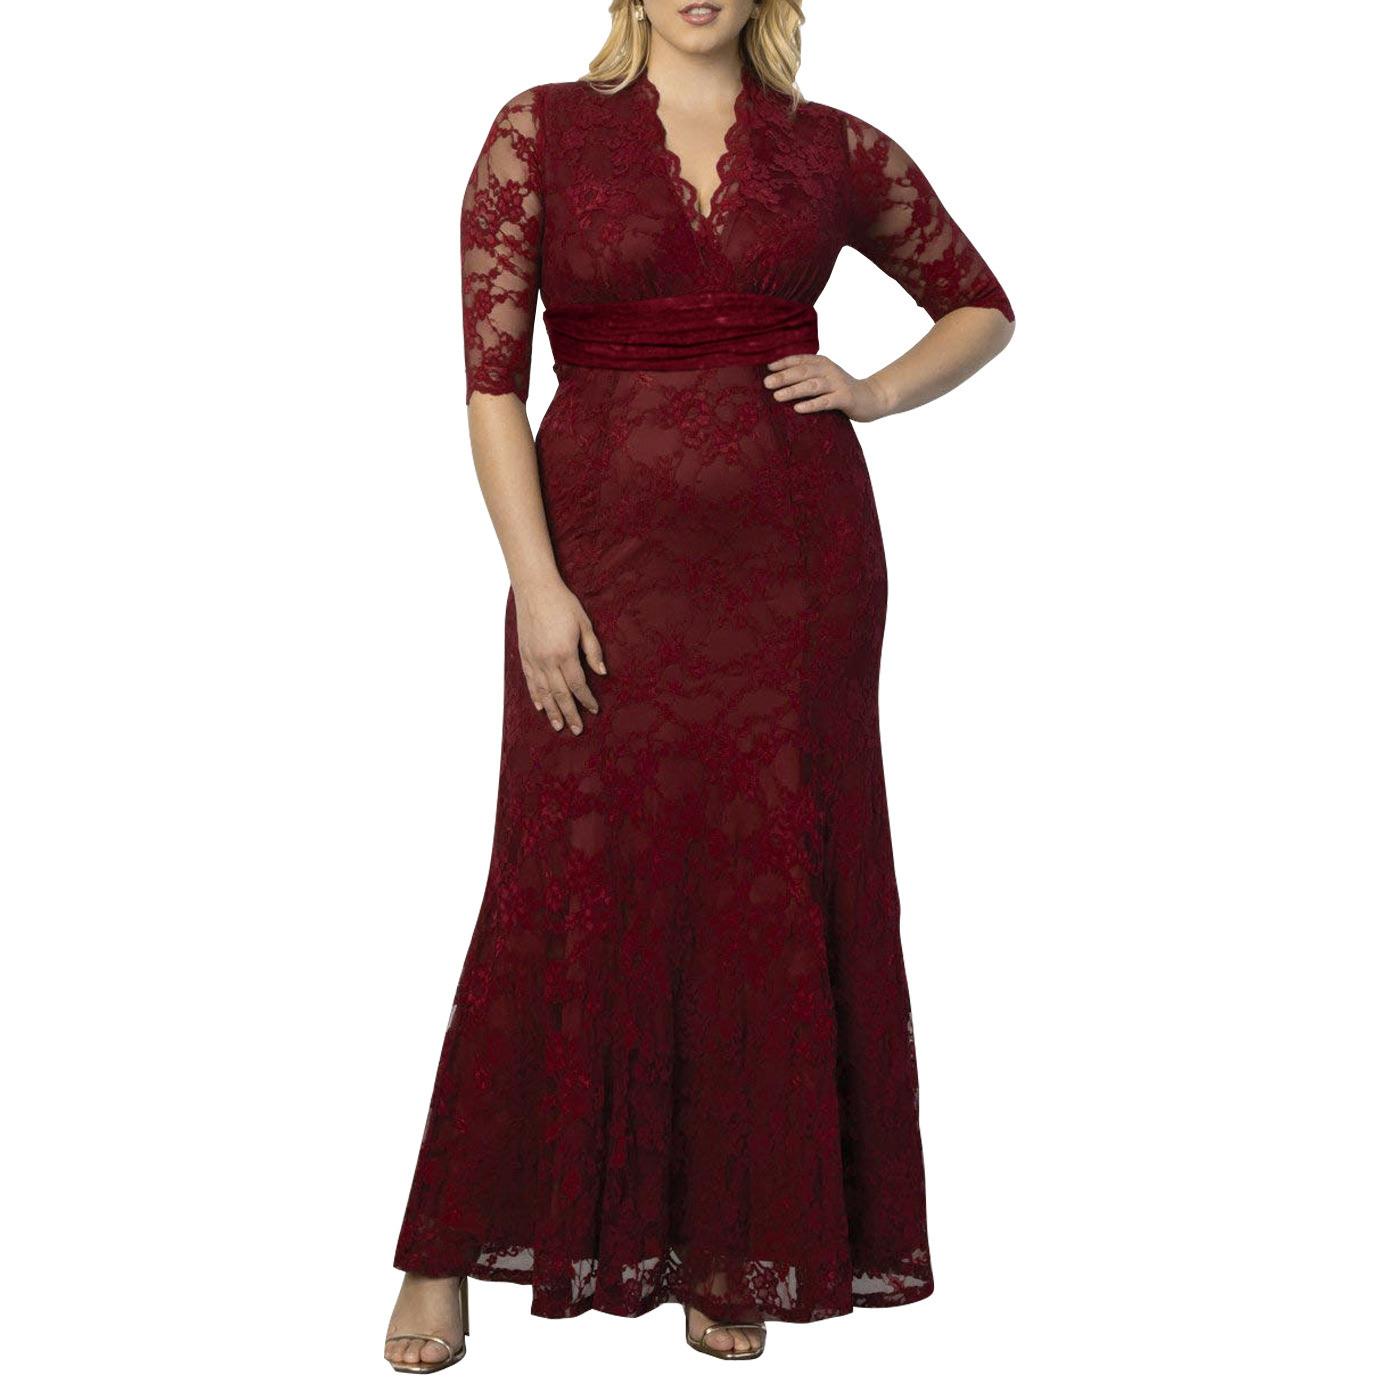 17 Elegant About You Abendkleid Blau Ärmel Genial About You Abendkleid Blau für 2019